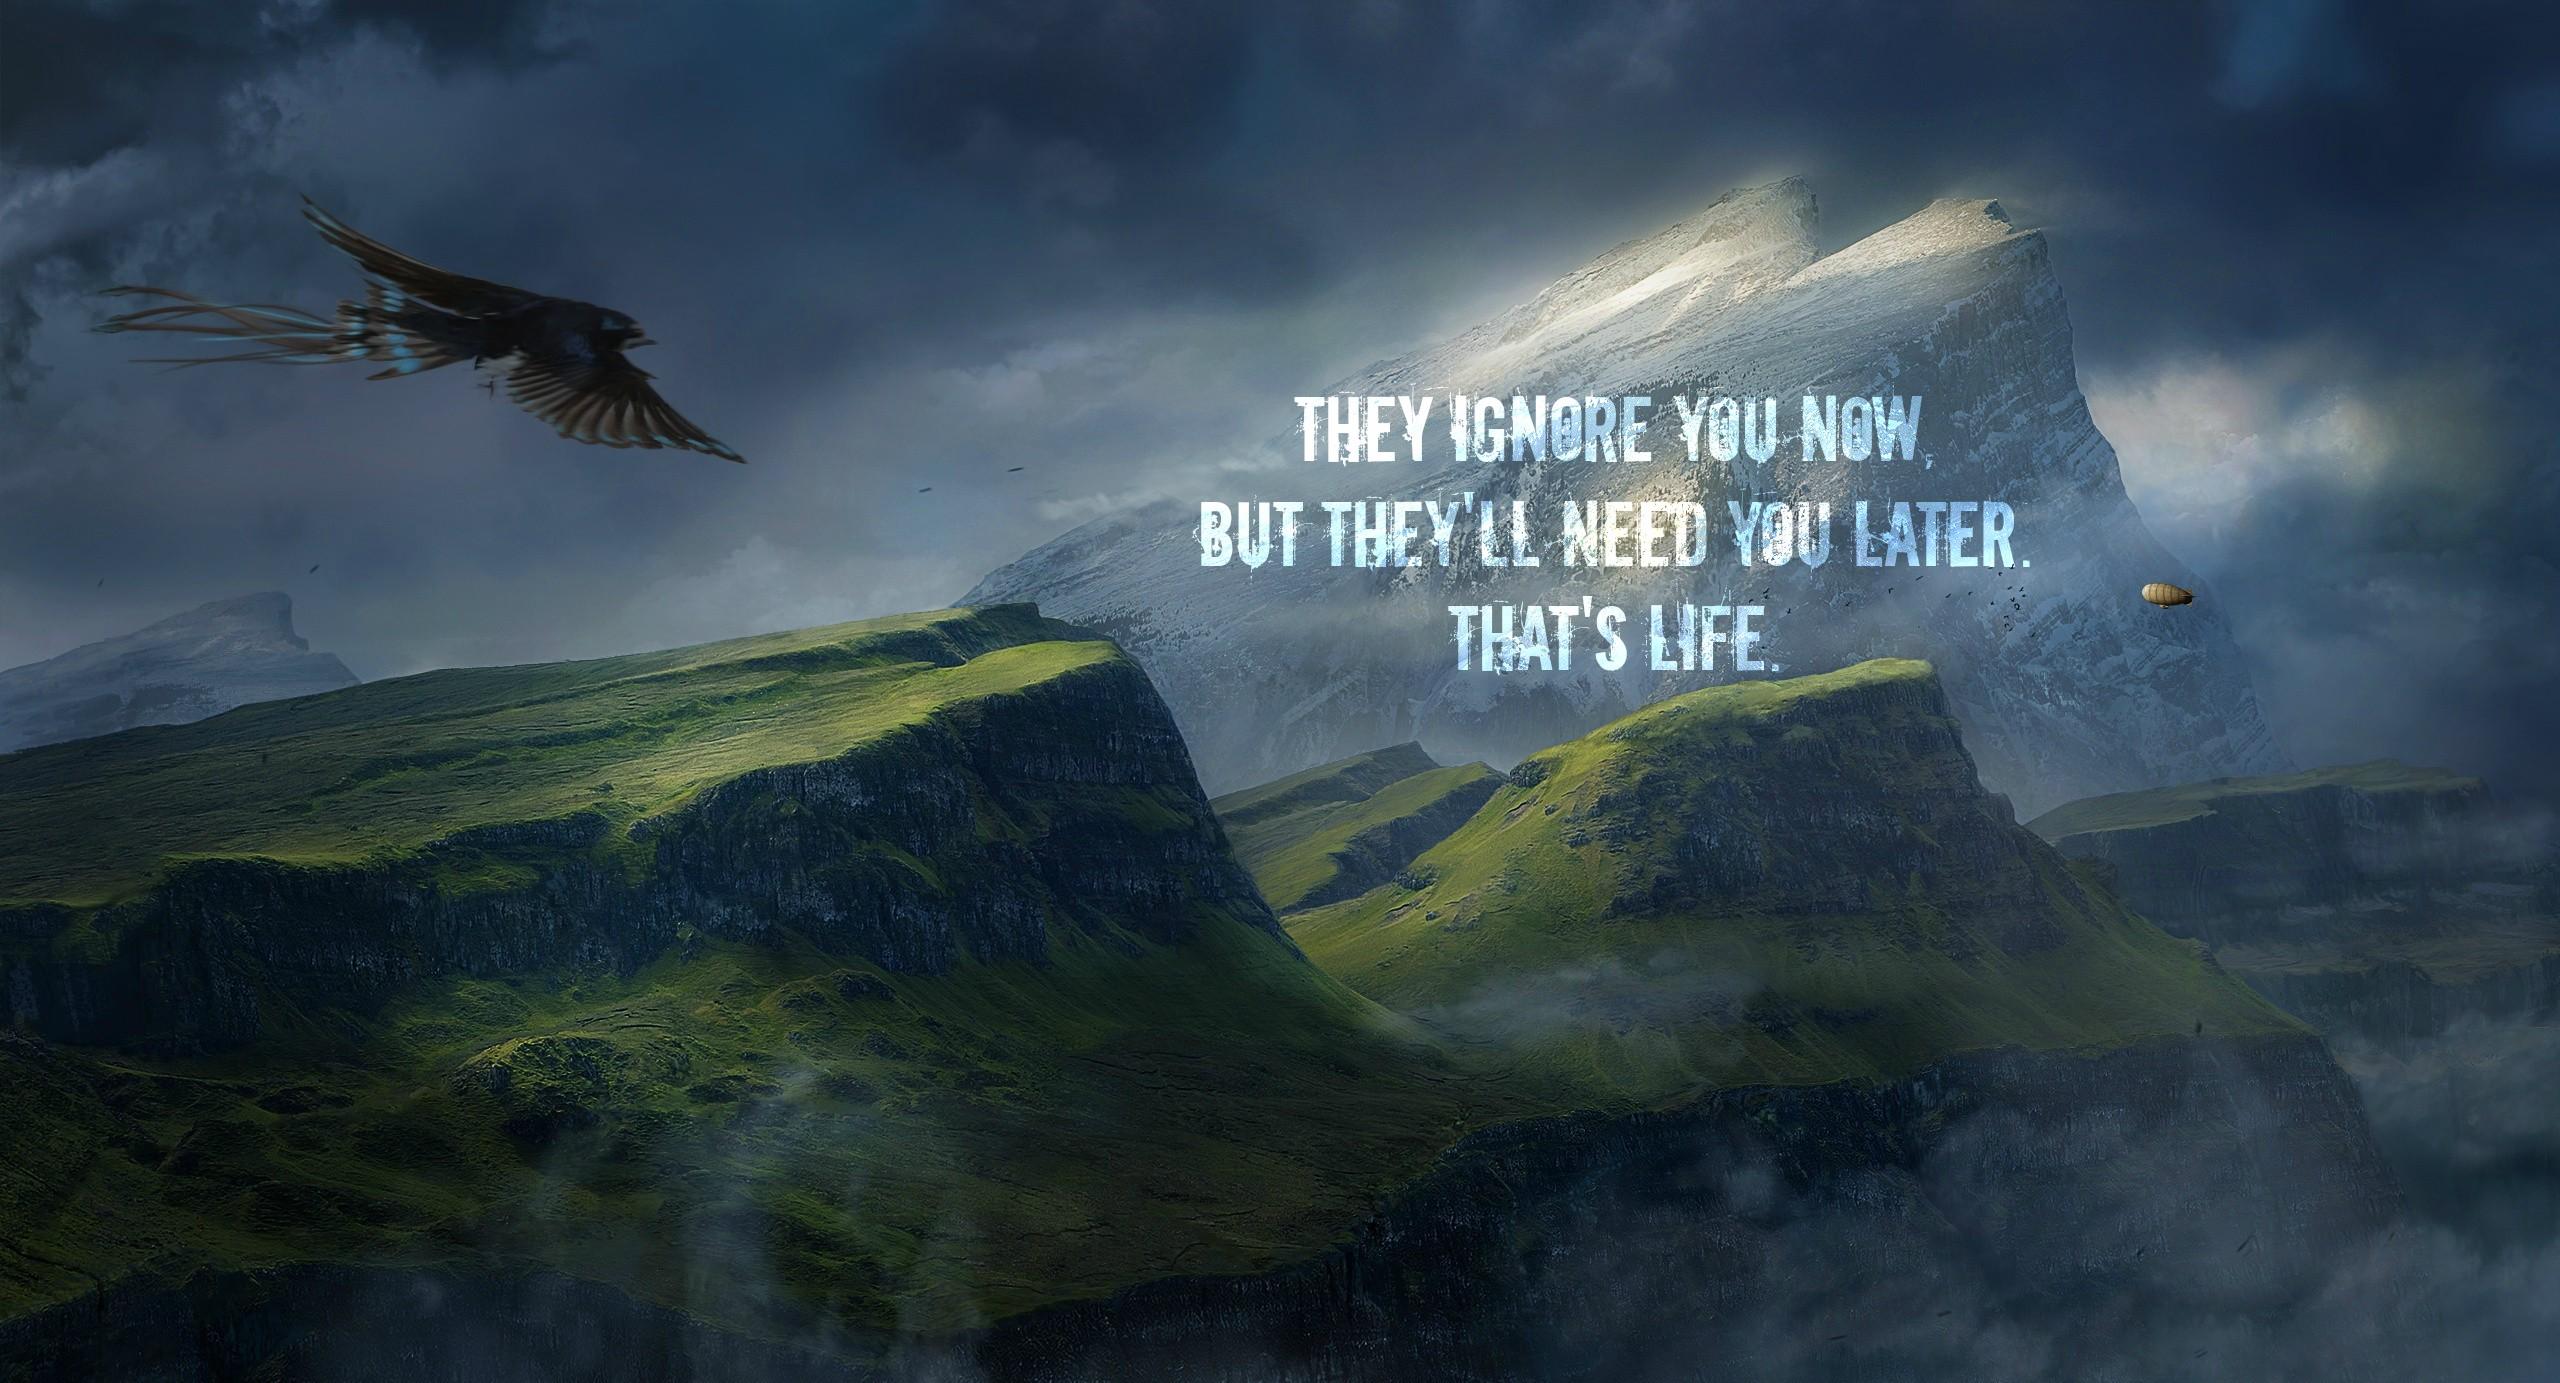 Amazing Wallpaper Mountain Quote - landscape-quote-digital-art-birds-animals-nature-sky-atmosphere-inspirational-eagle-cloud-mountain-darkness-screenshot-computer-wallpaper-mountain-range-meteorological-phenomenon-phenomenon-2560x1383-px-visual-effects-787699  Picture_487084.jpg